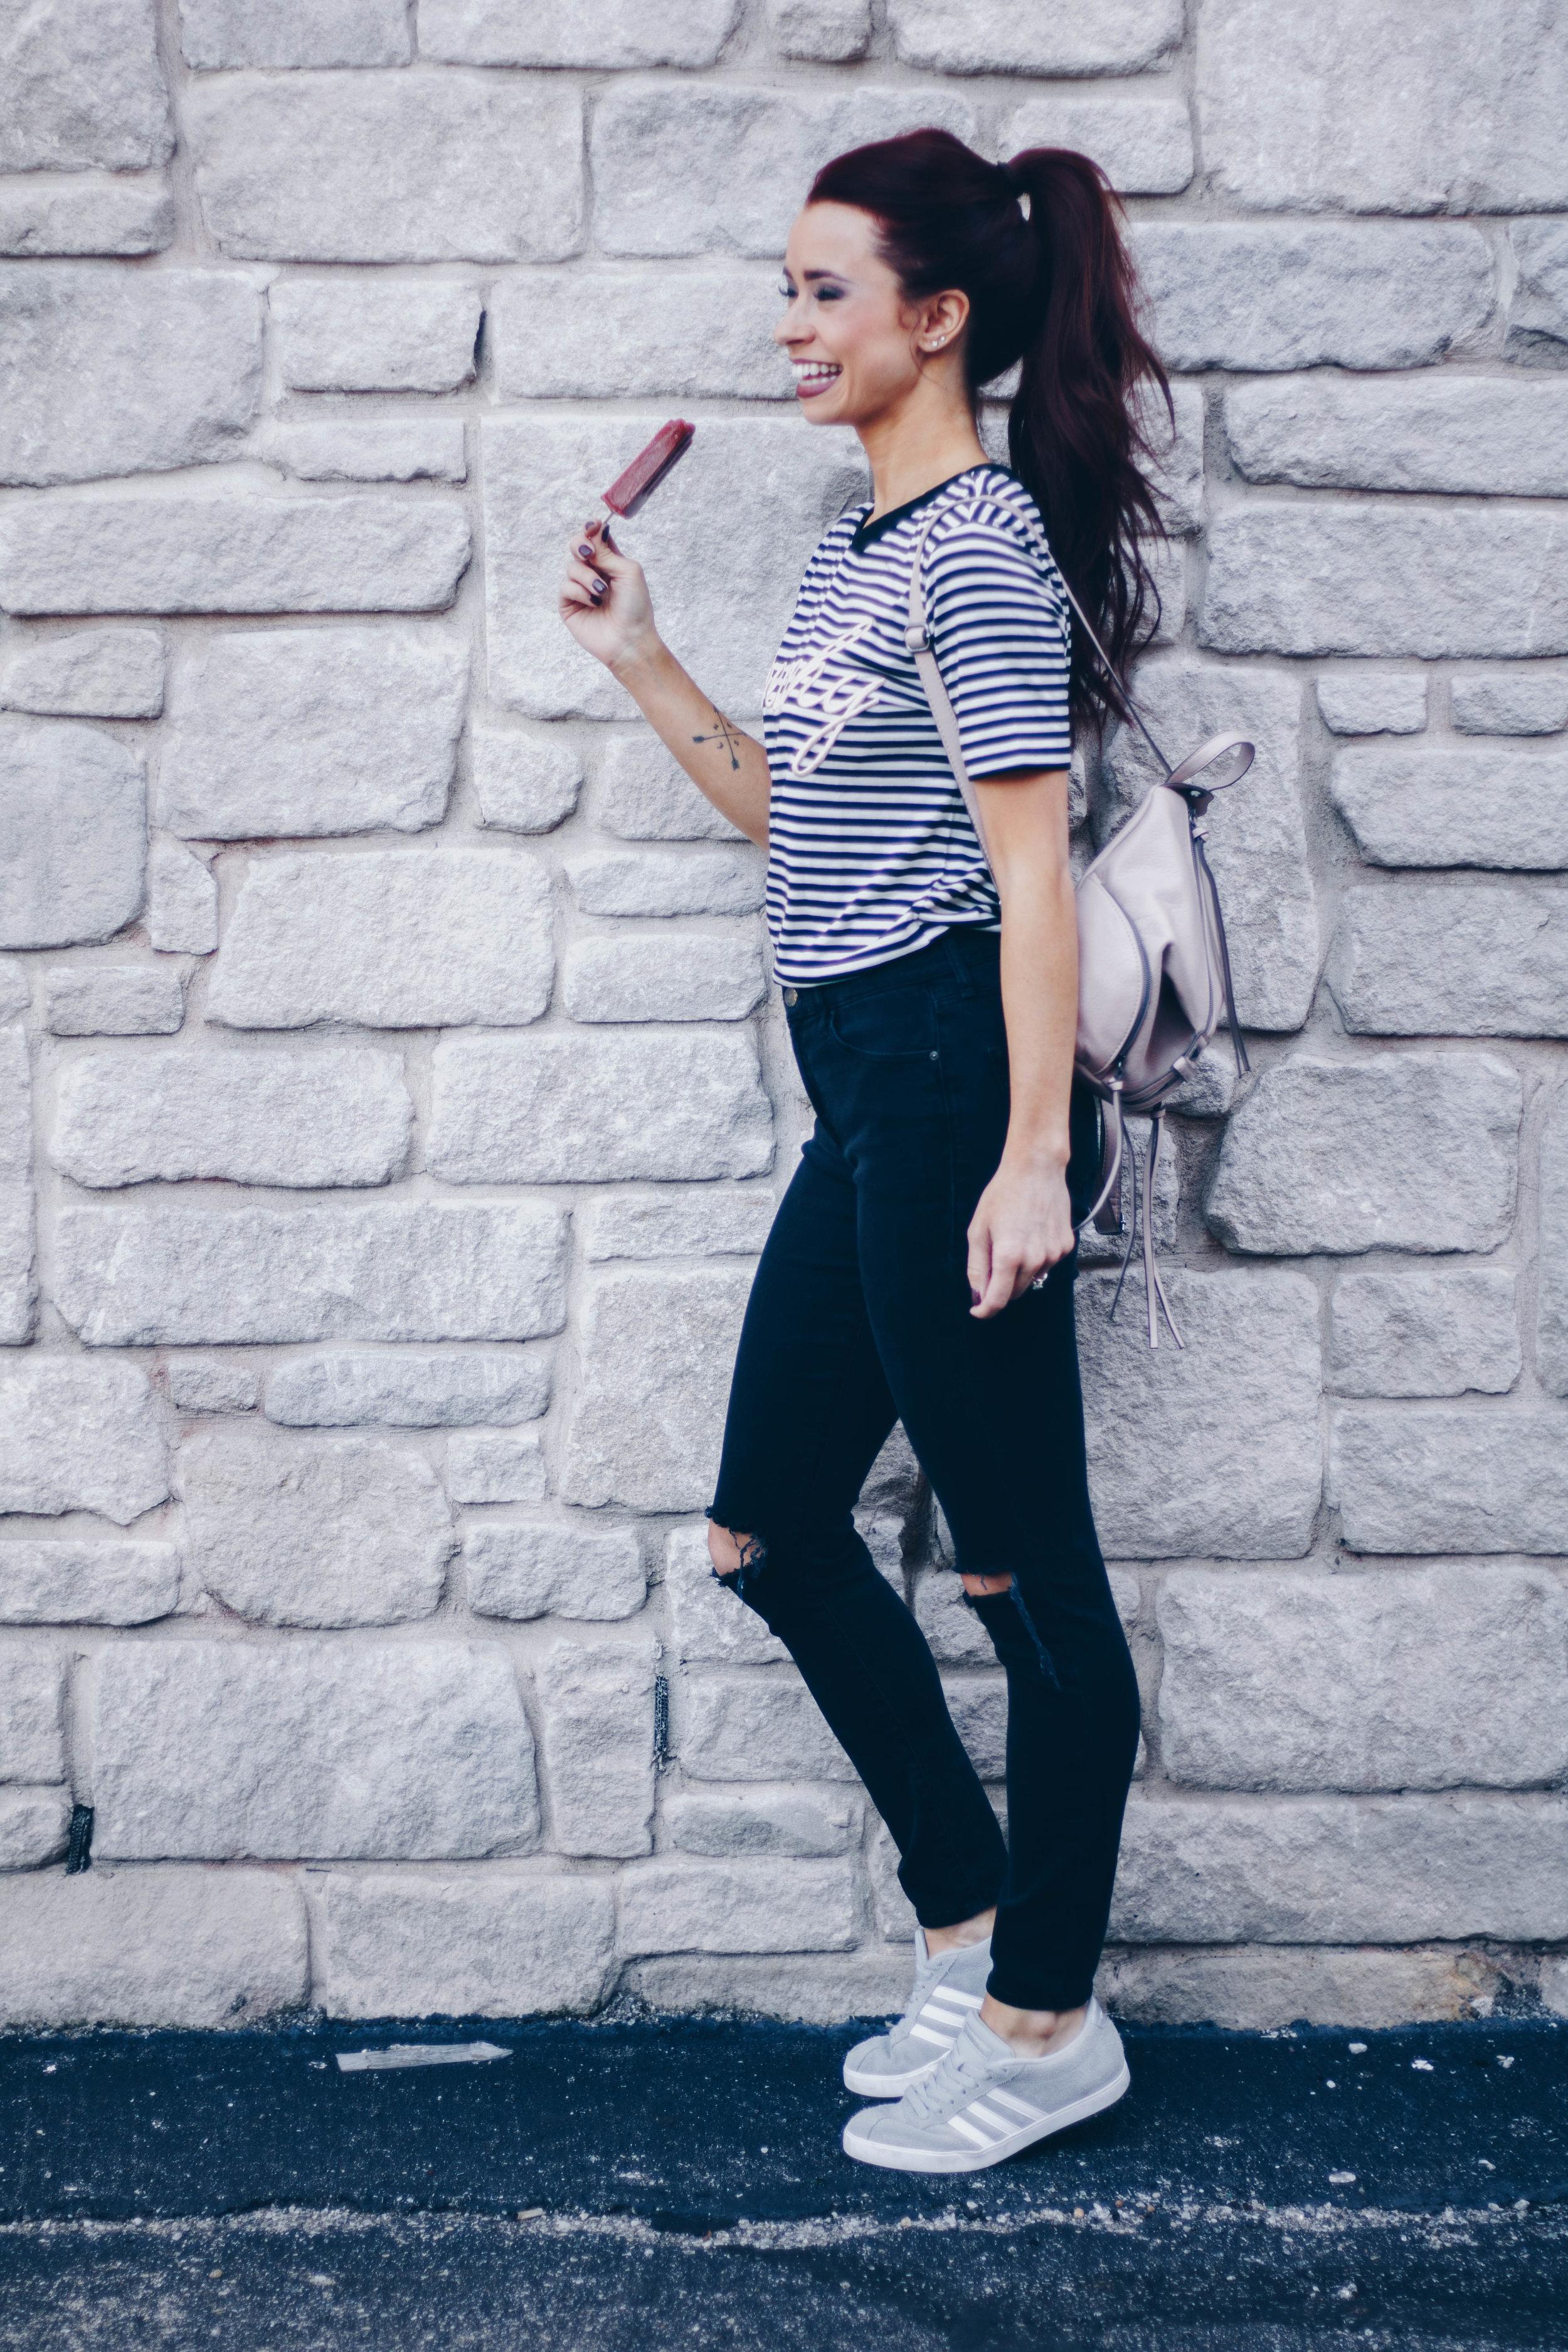 Peachy Top  ||  Favorite Black Jeans  ||  Adidas Kicks